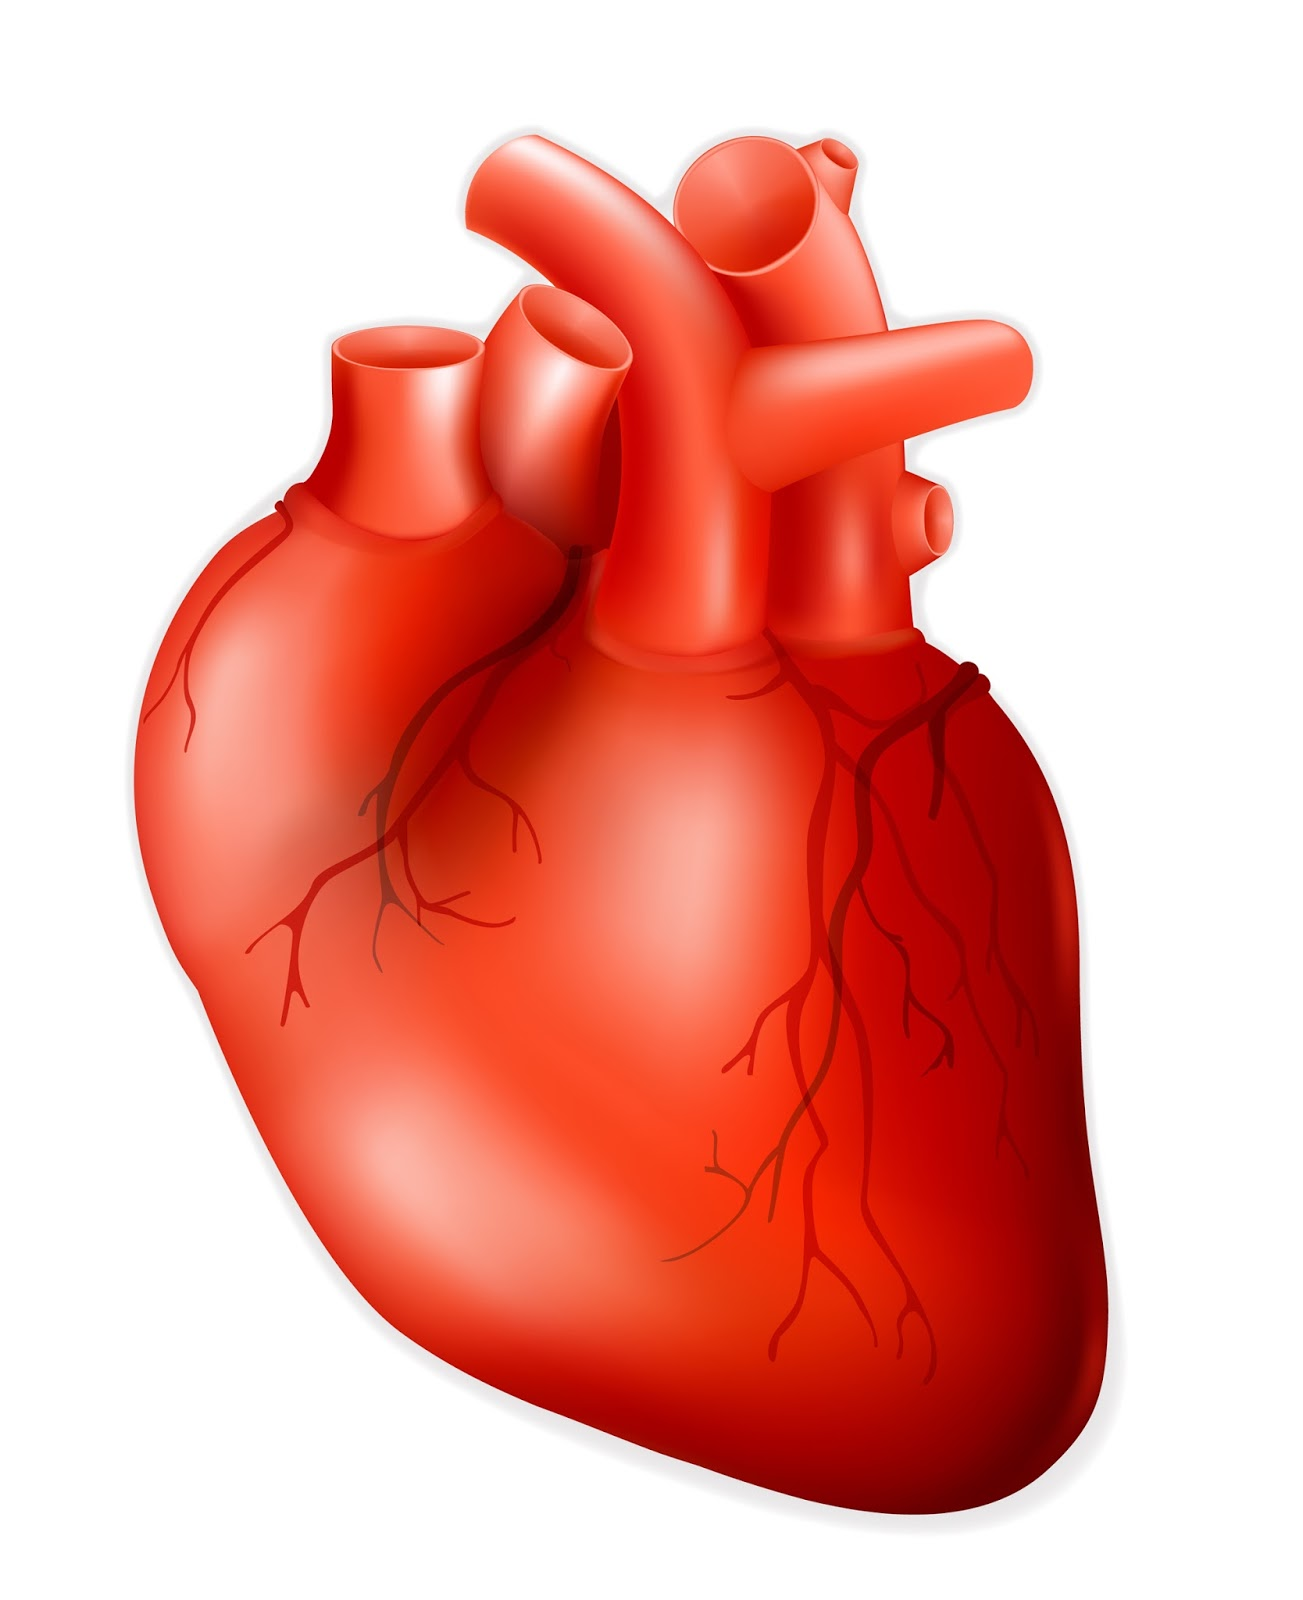 Free Heart Human, Download Free Clip Art, Free Clip Art on.